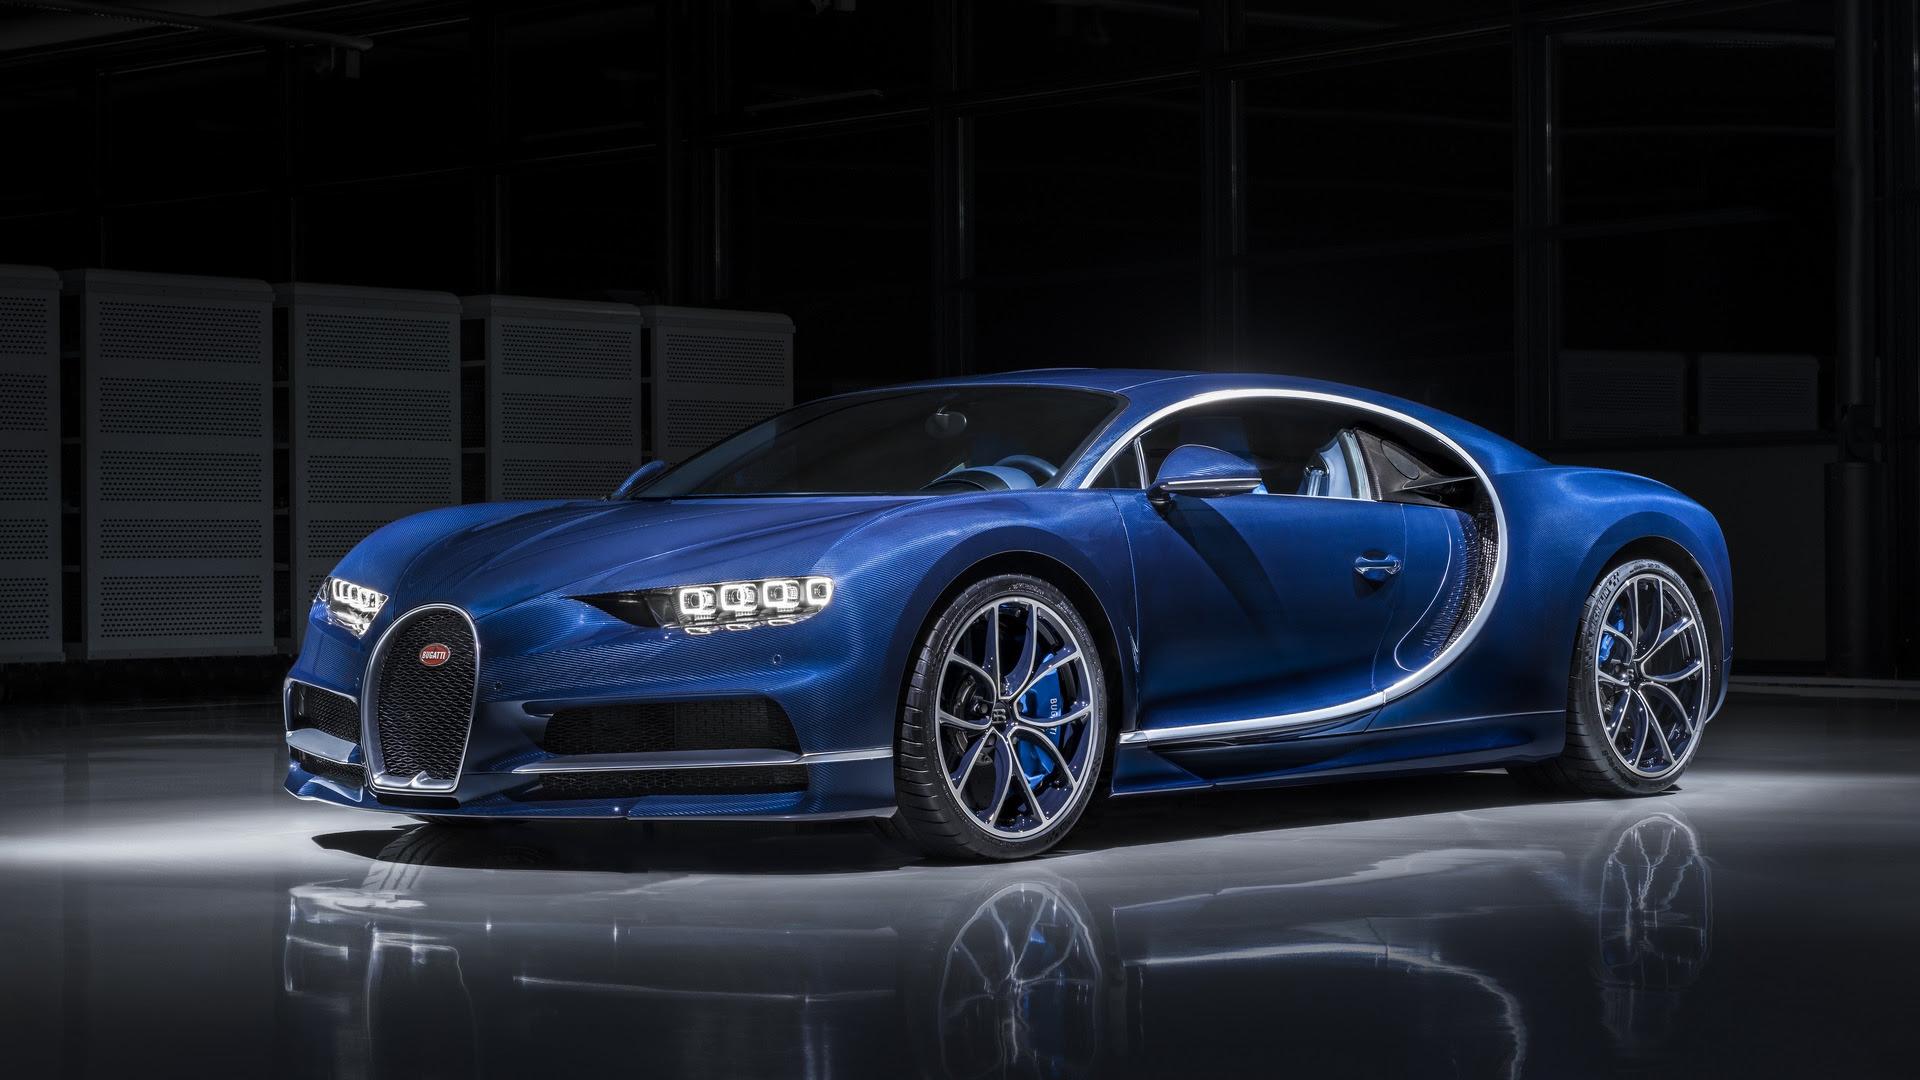 Bugatti Chiron in 'Bleu Royal' exposed carbon fibre will be at Geneva - Autodevot